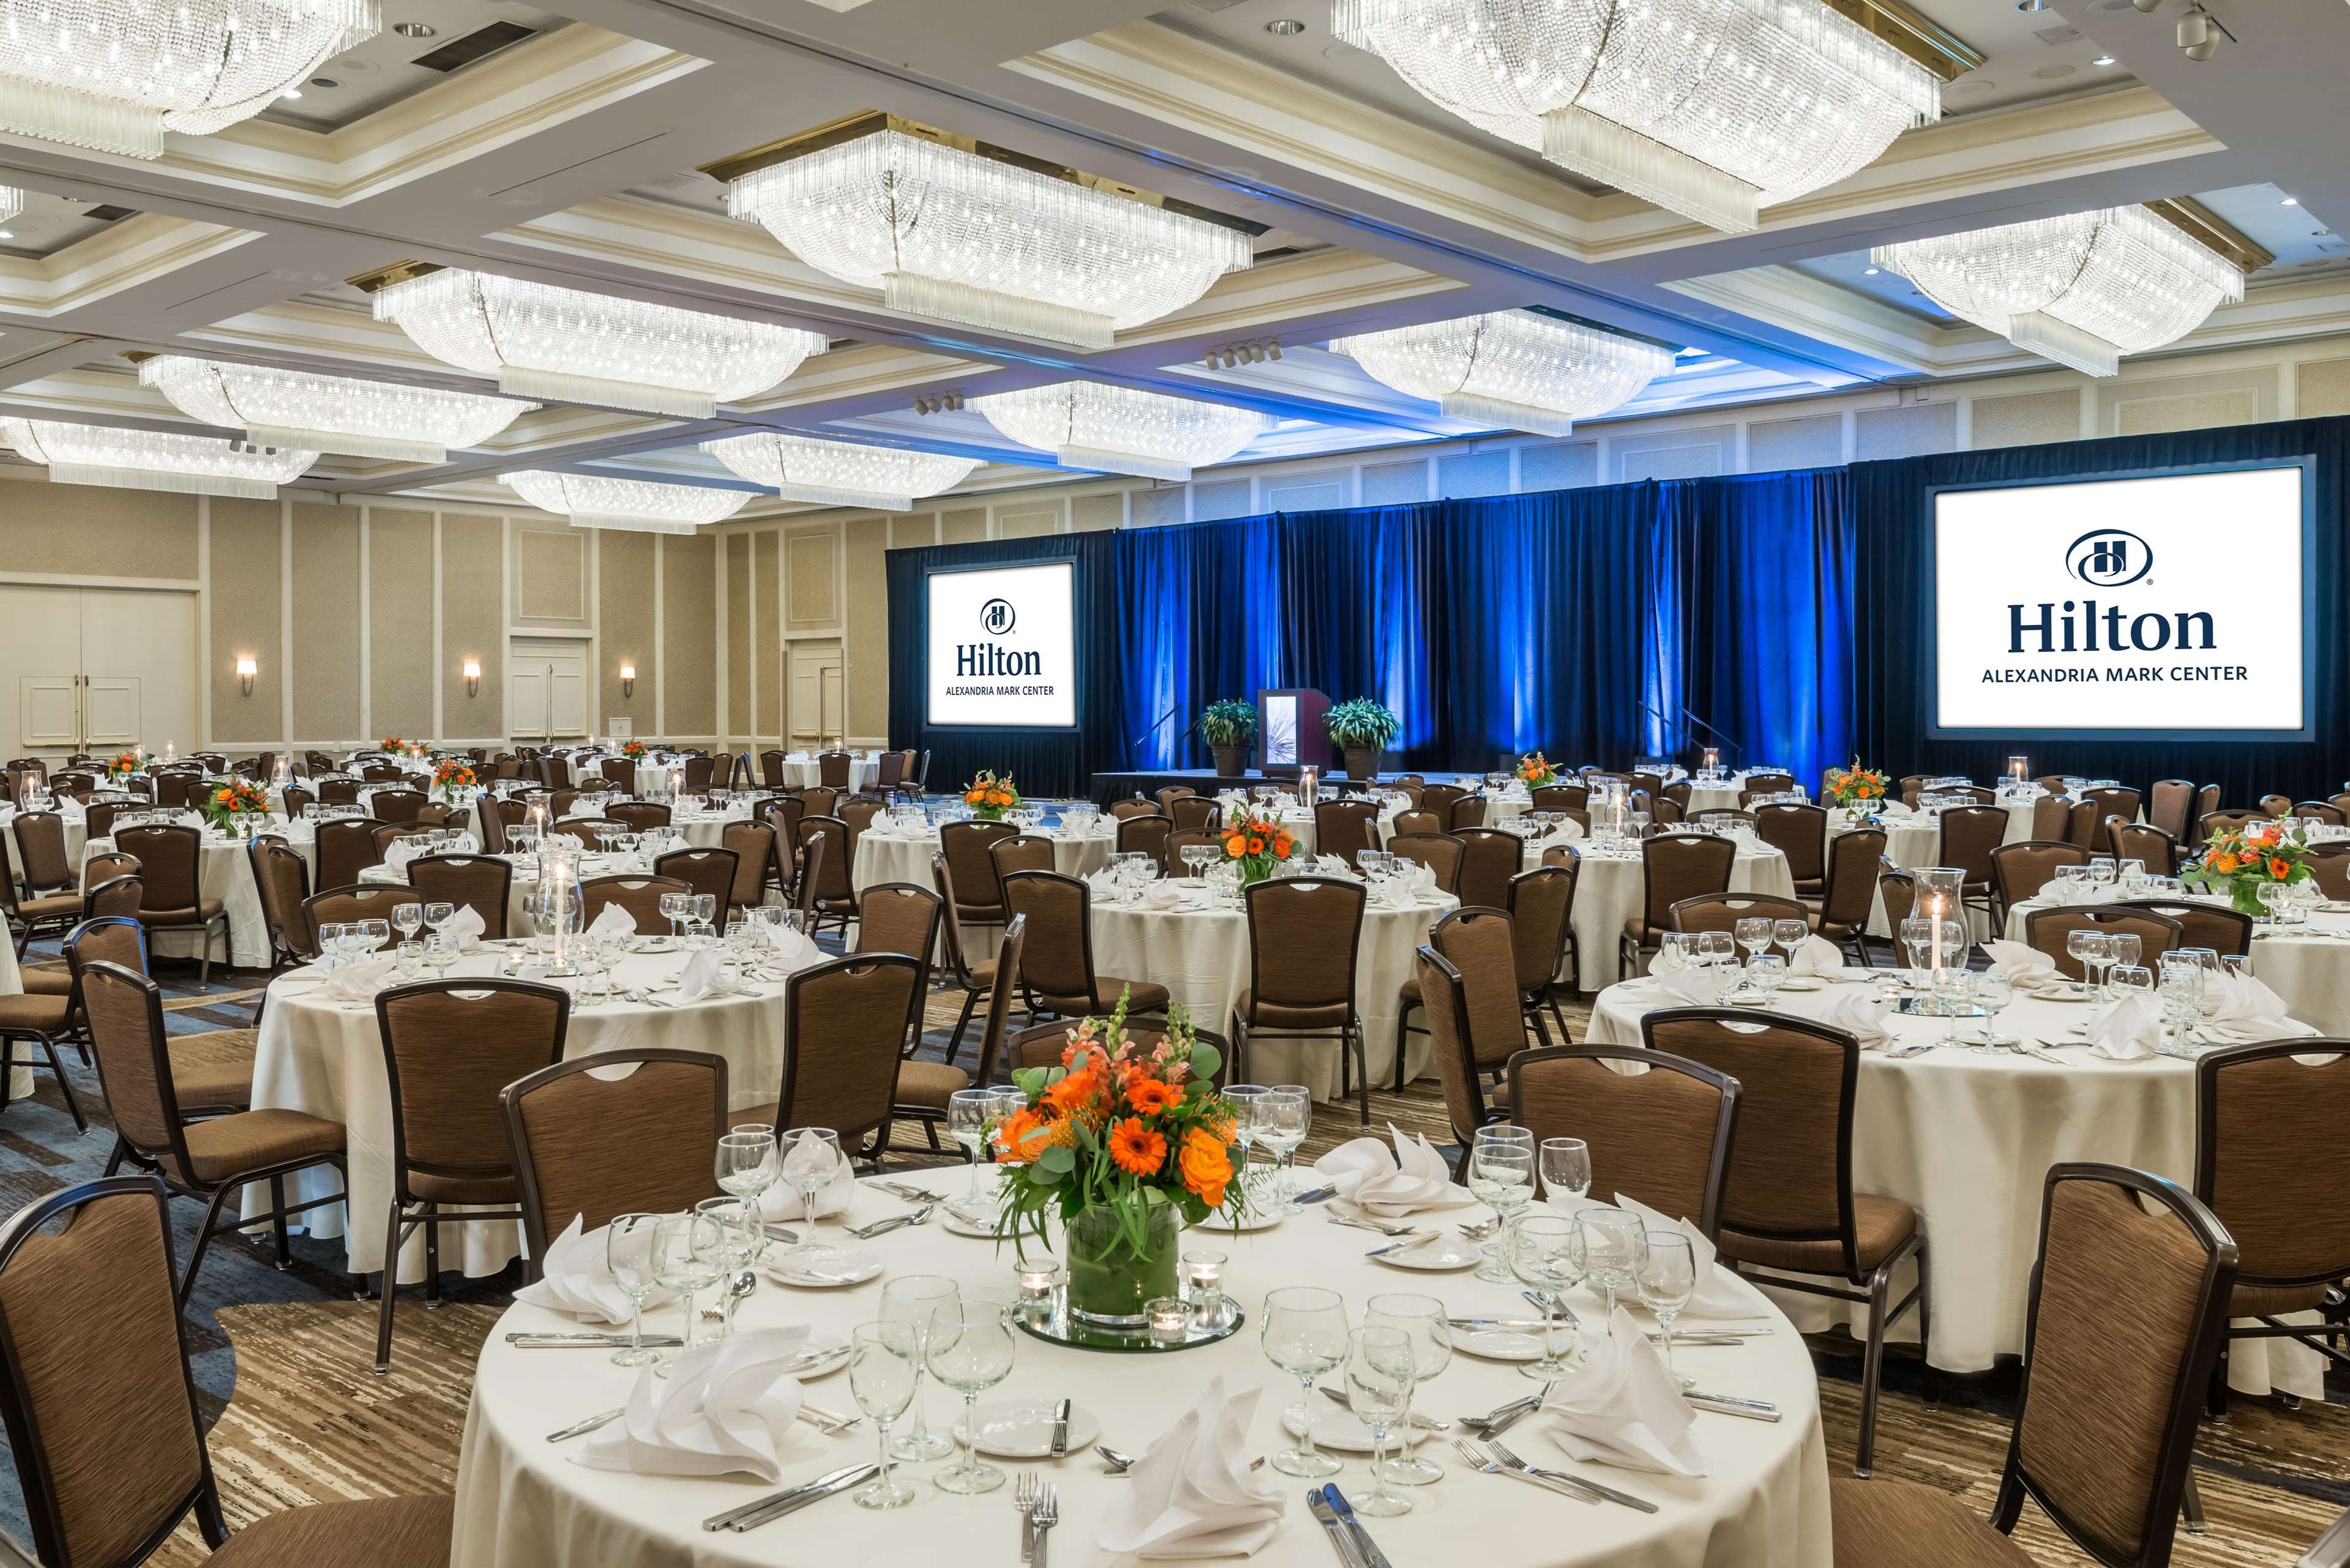 Hilton Mark Center Meeting Rooms